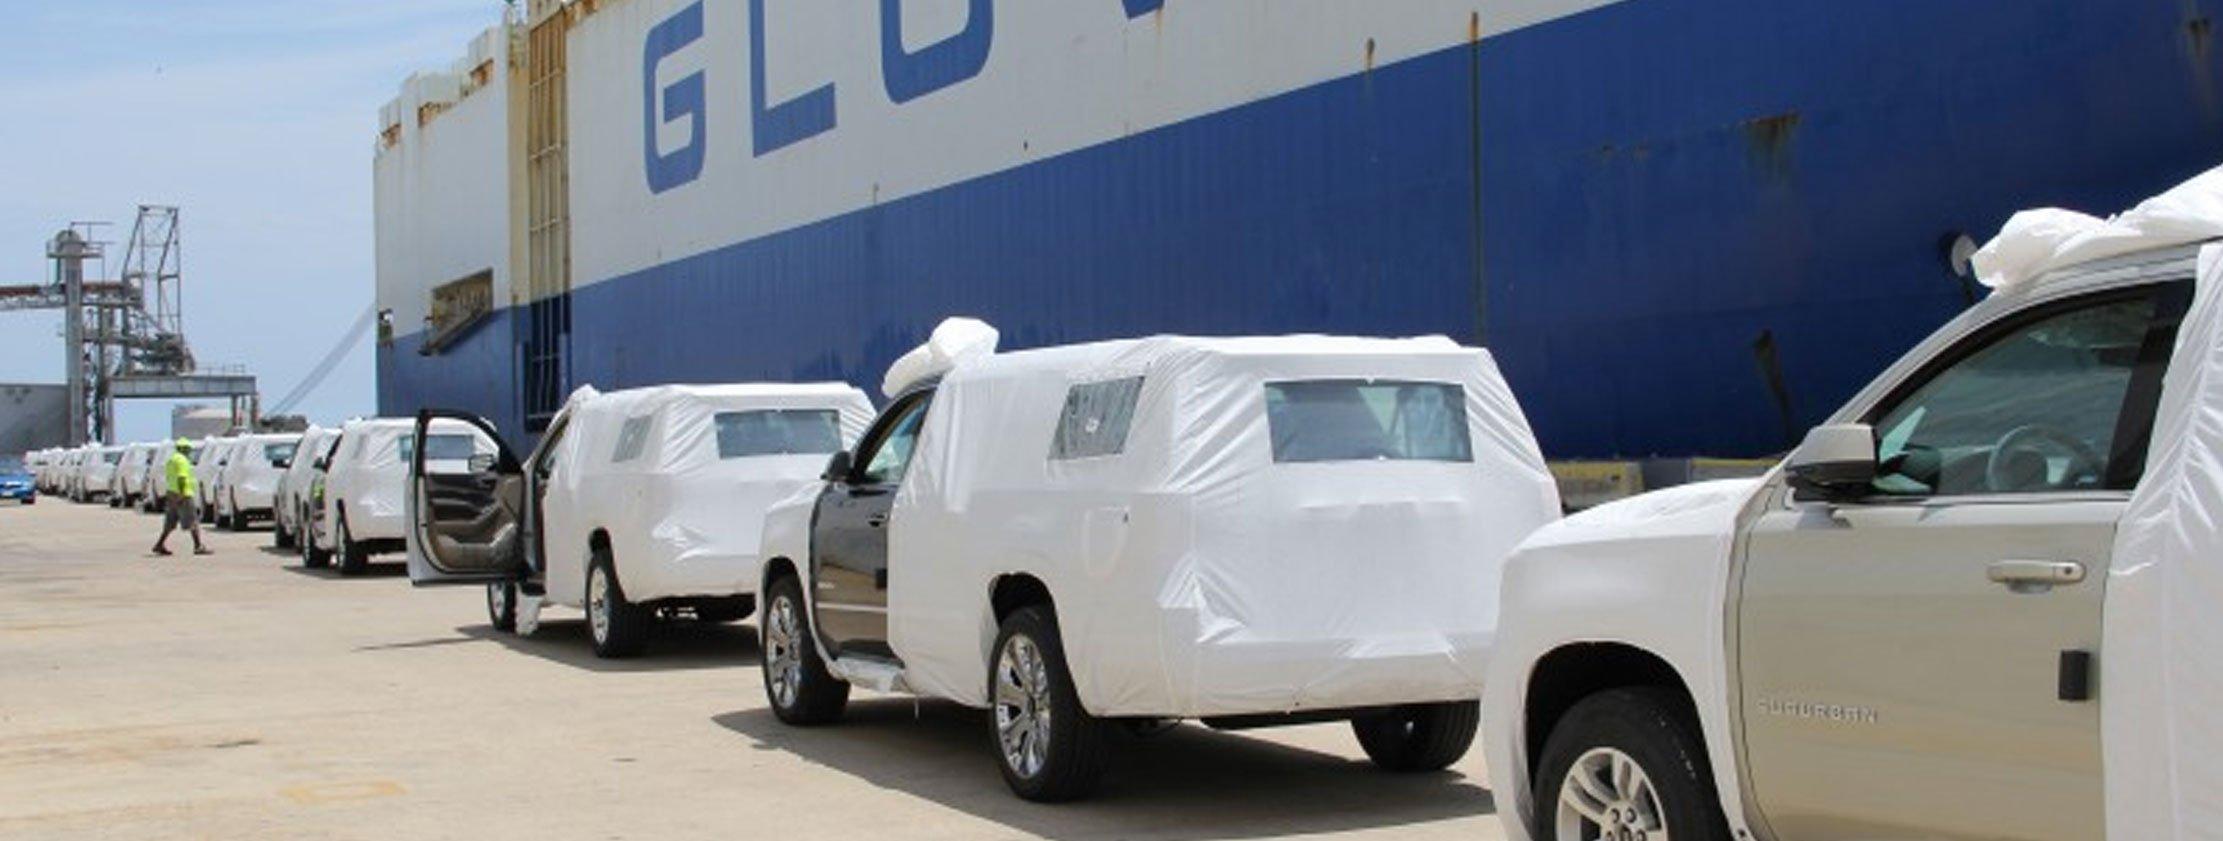 car transport port freeport